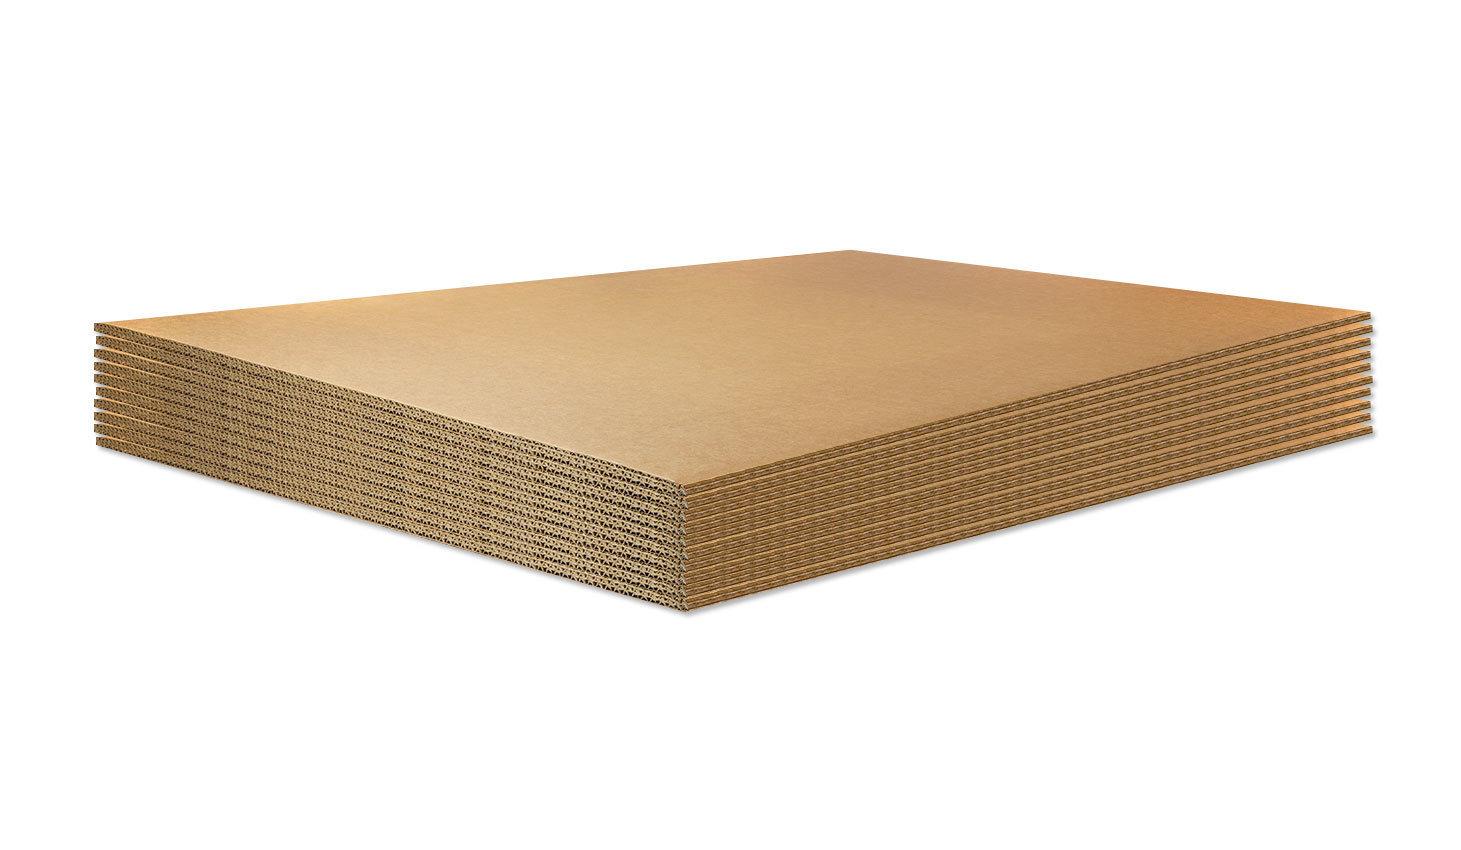 BASE IN CARTONE per ECOPALLET 80x120cm X 14mm • 10 pezzi